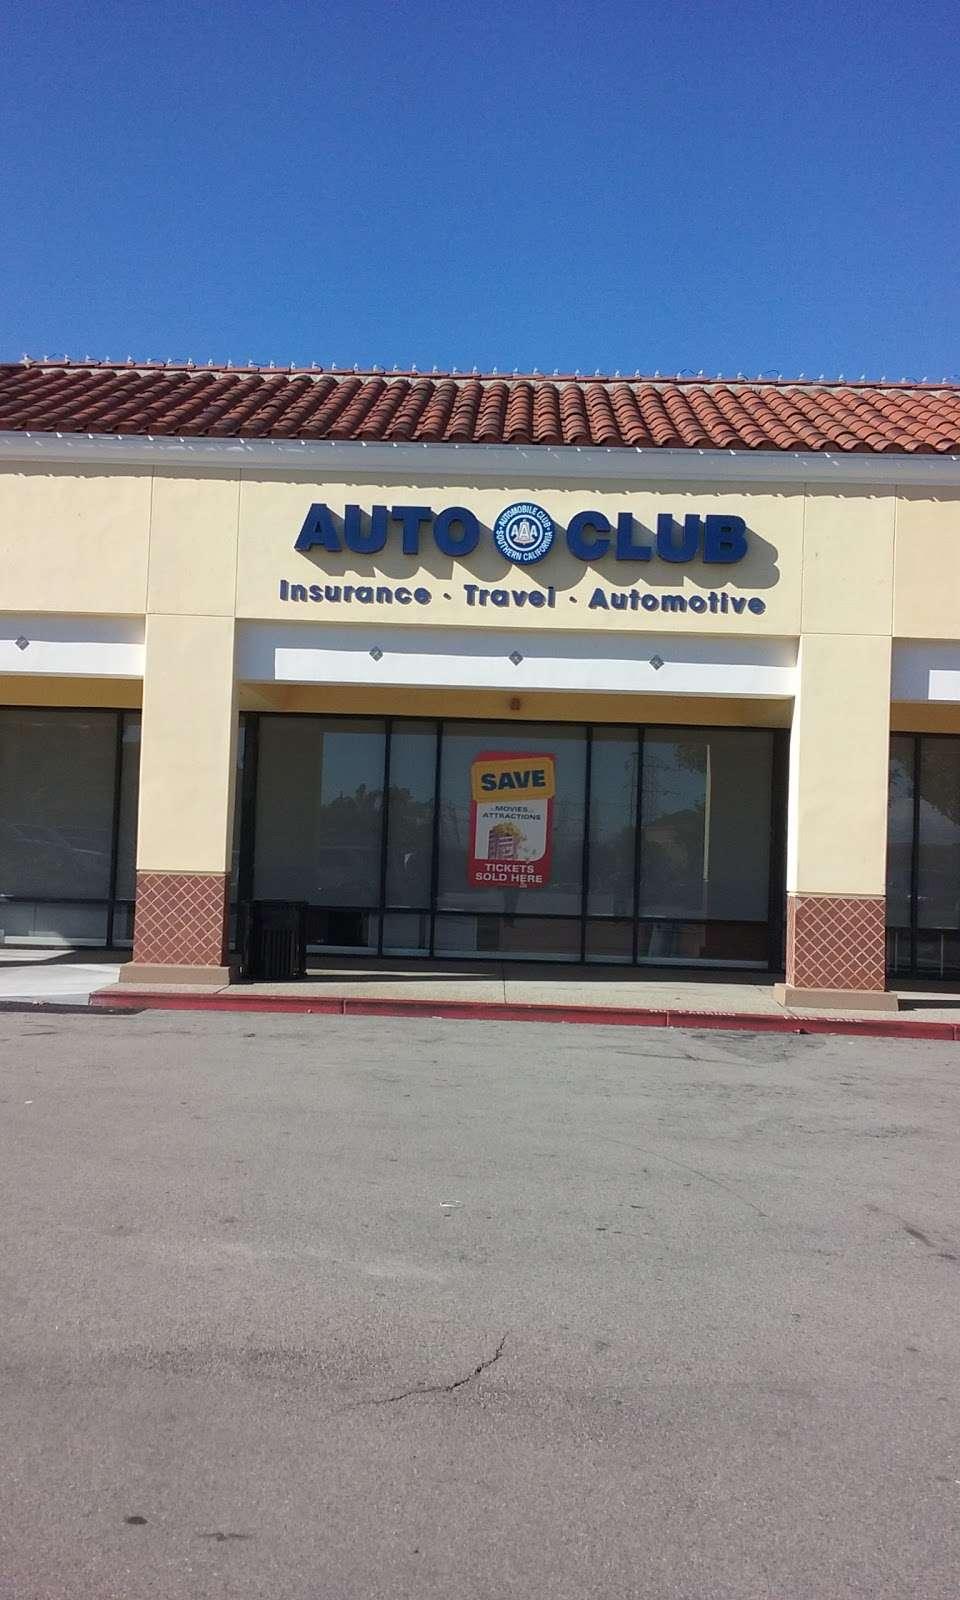 AAA - Automobile Club of Southern California - insurance agency  | Photo 4 of 7 | Address: 1405 N Montebello Blvd, Montebello, CA 90640, USA | Phone: (323) 725-6545